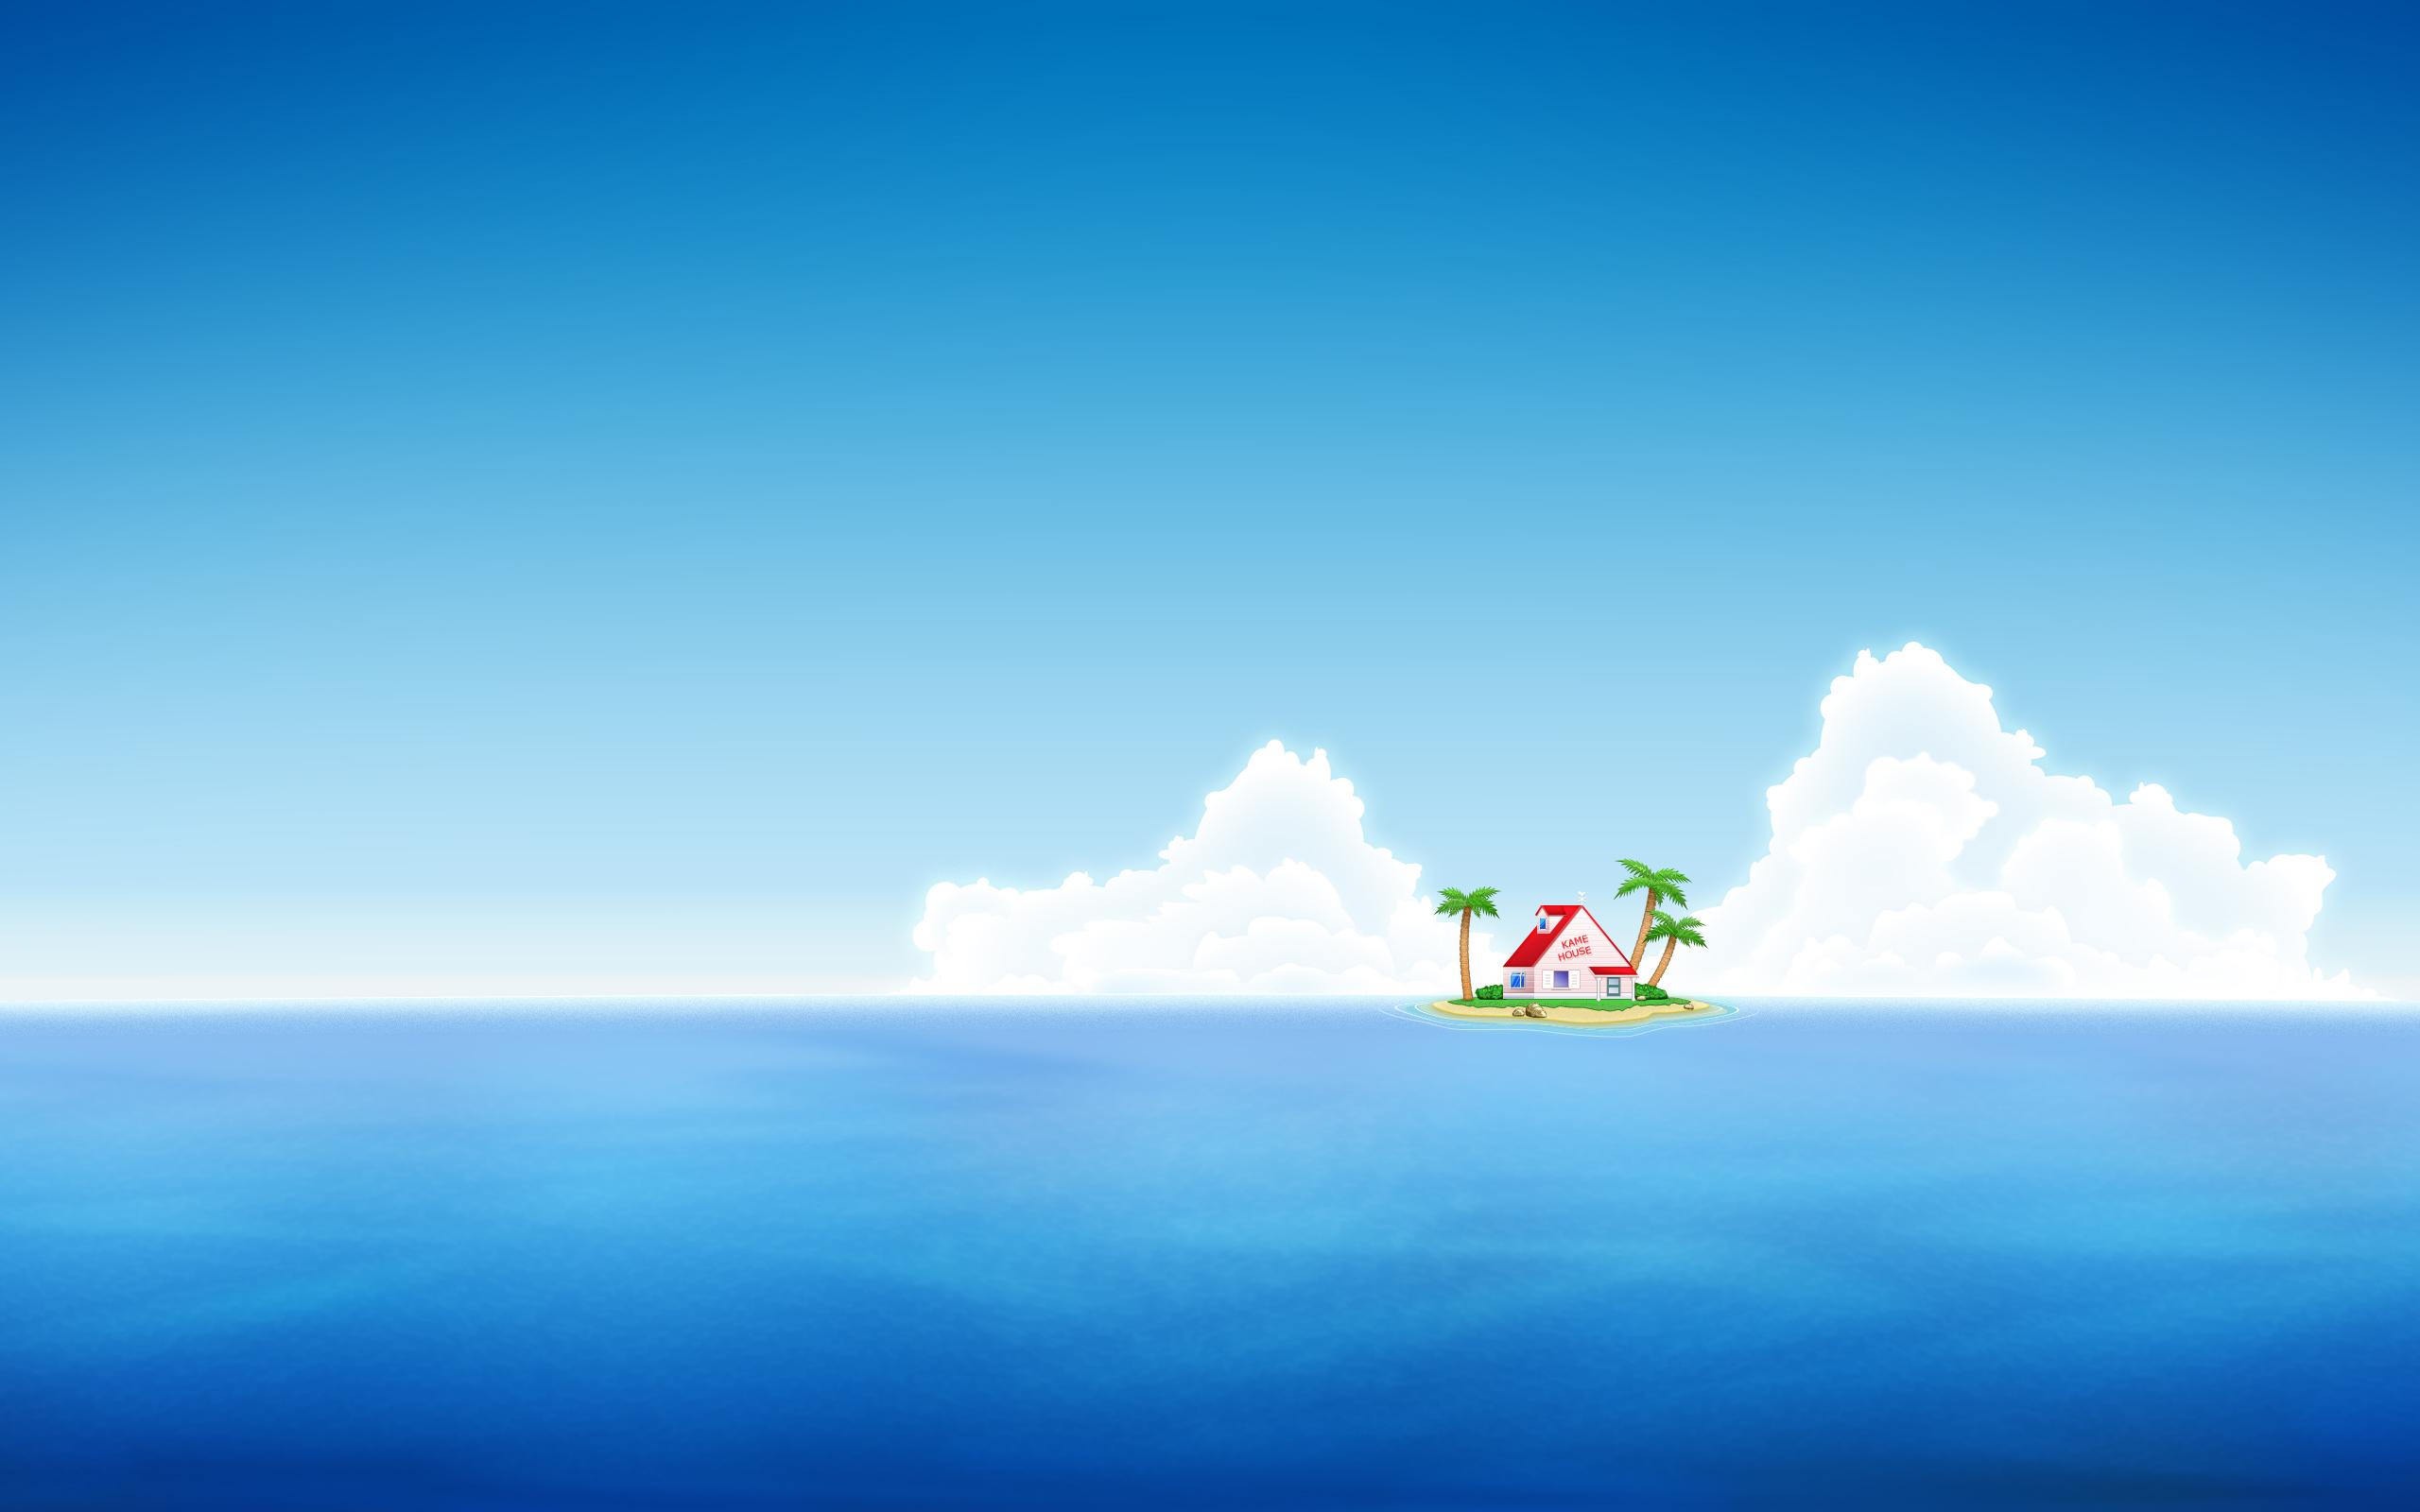 kame-house-dragon-ball-gs.jpg